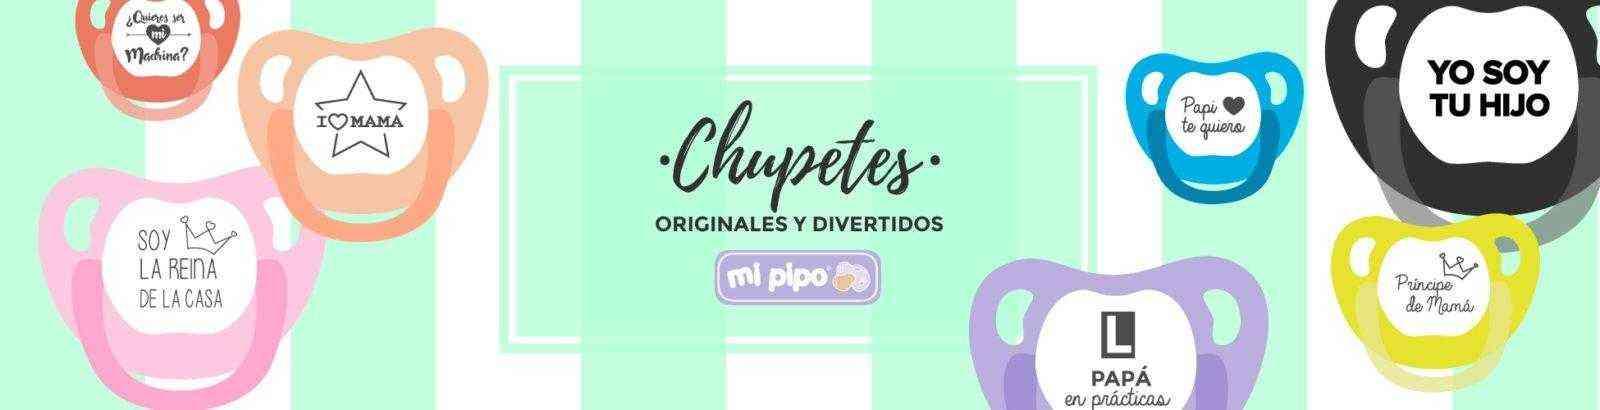 CHUPETES MI PIPO DIVERTIDOS ORIGINALES